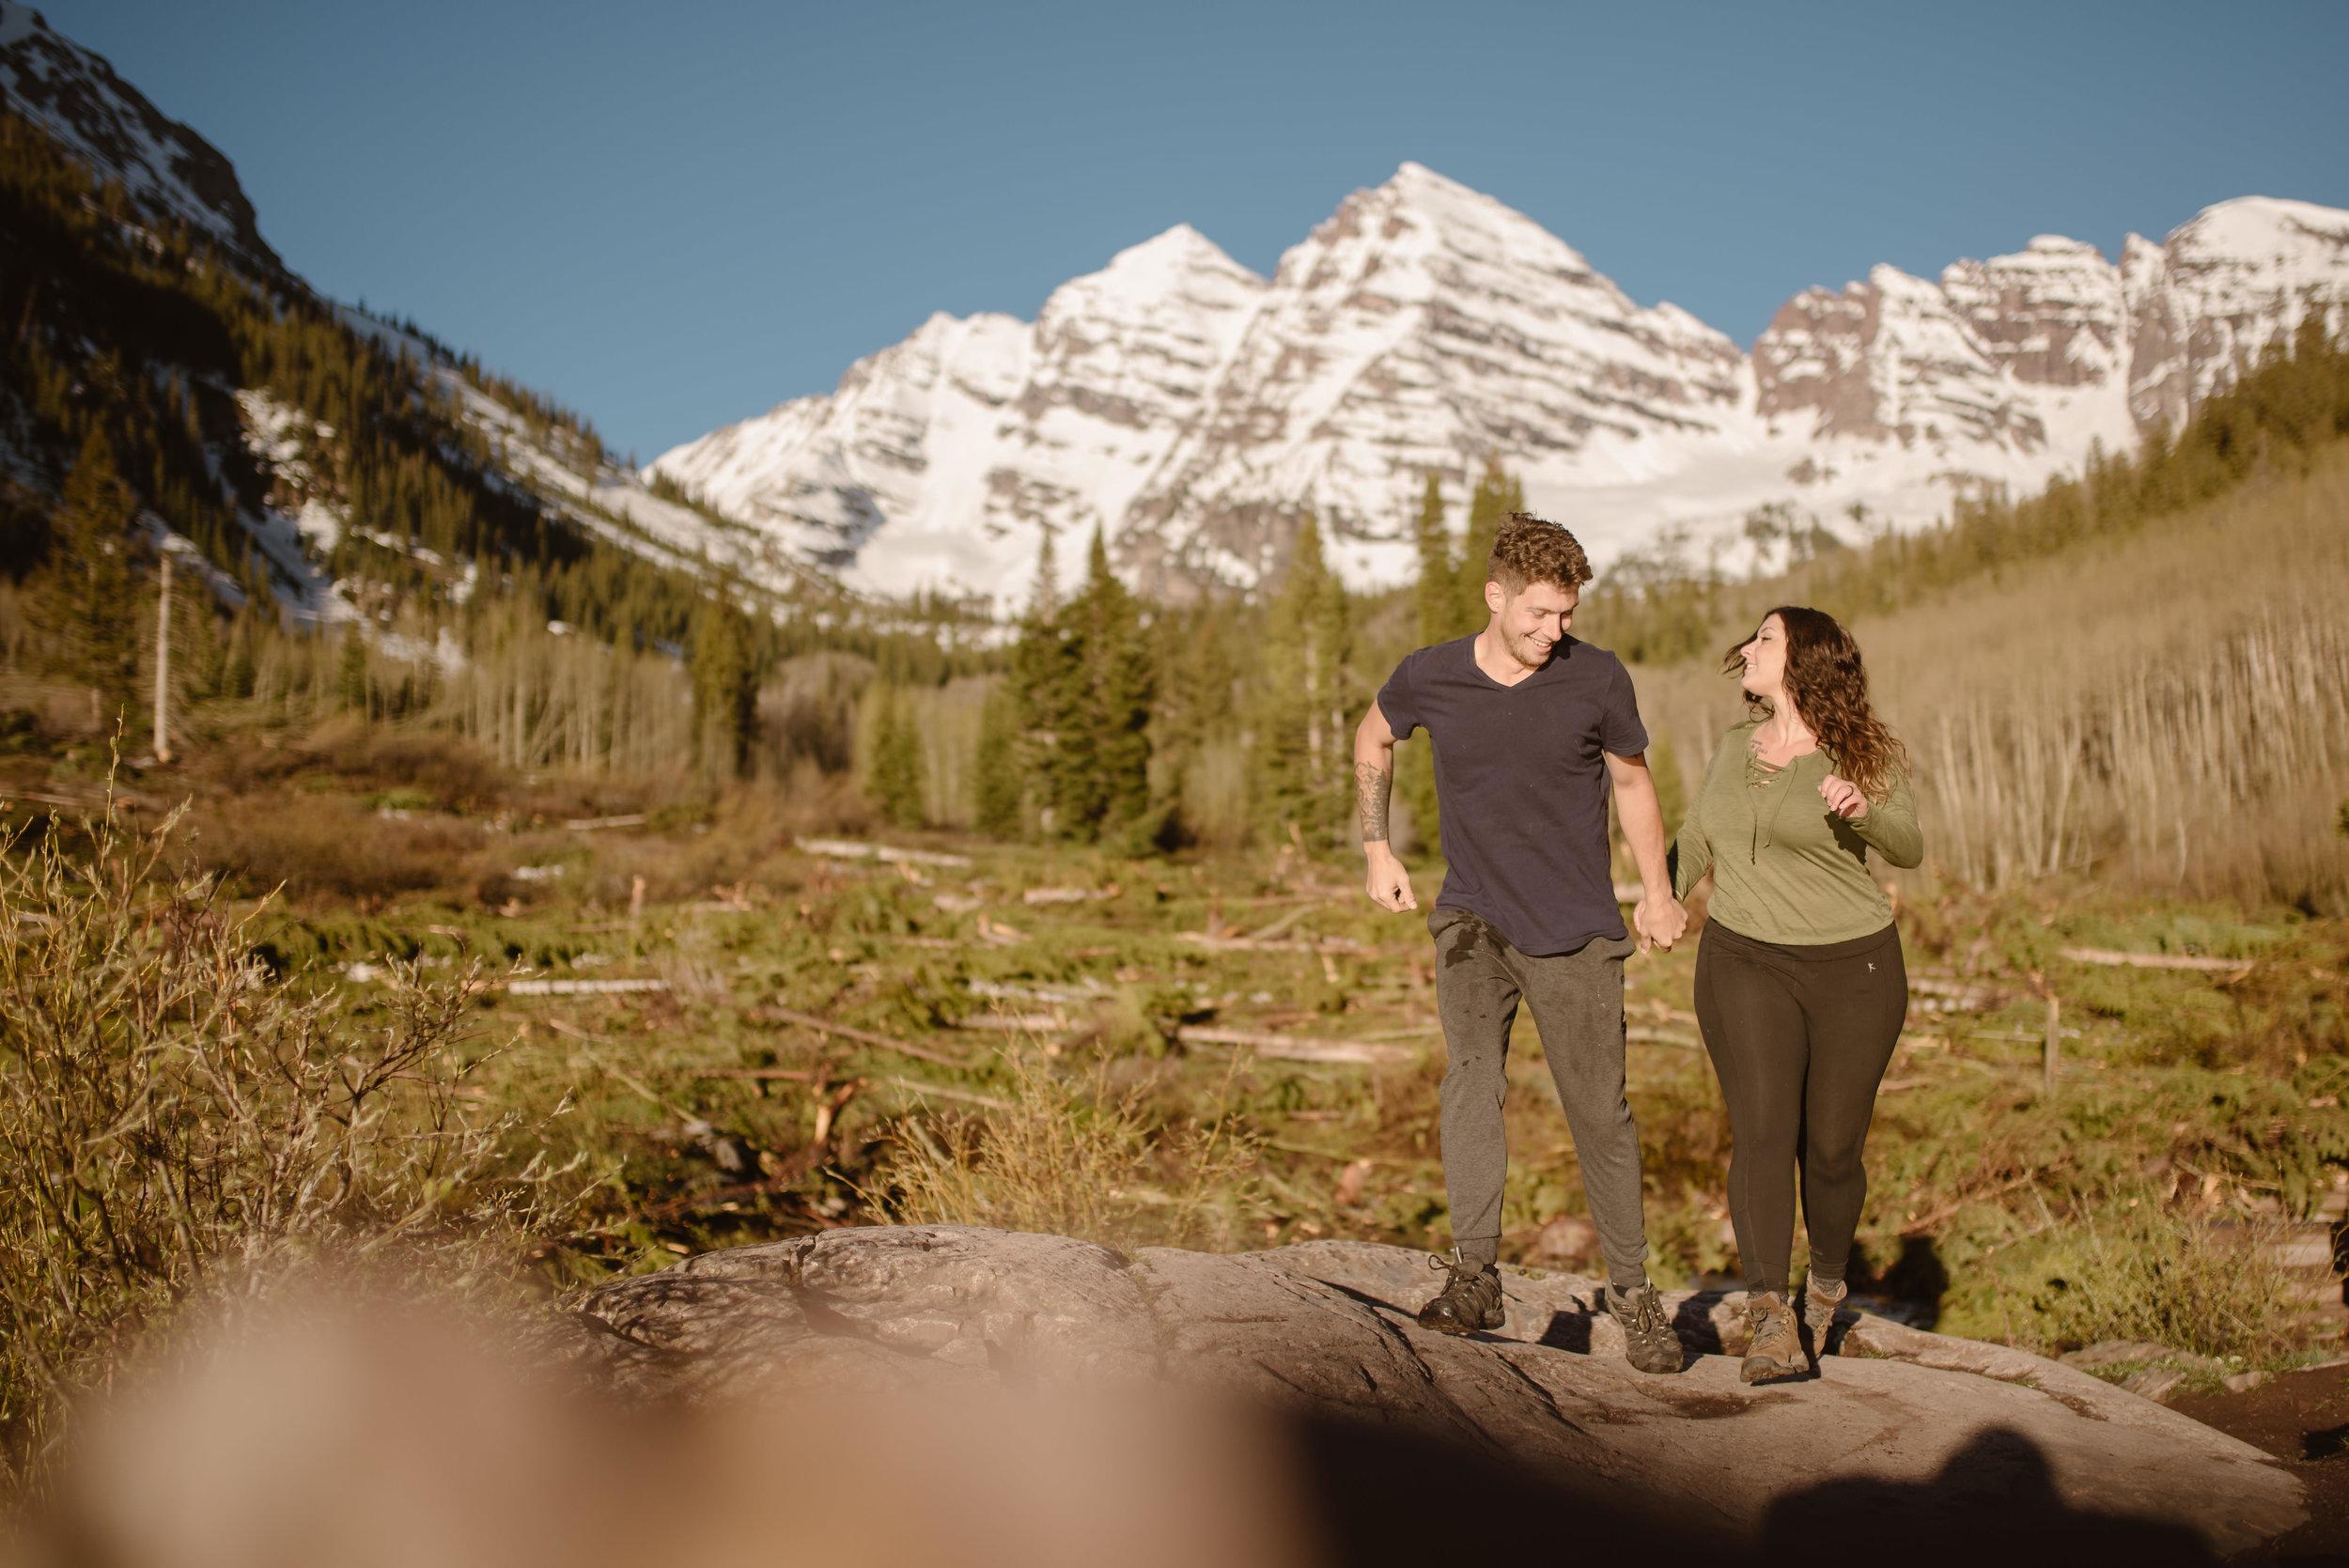 hiking-honey-moon-photoshoot